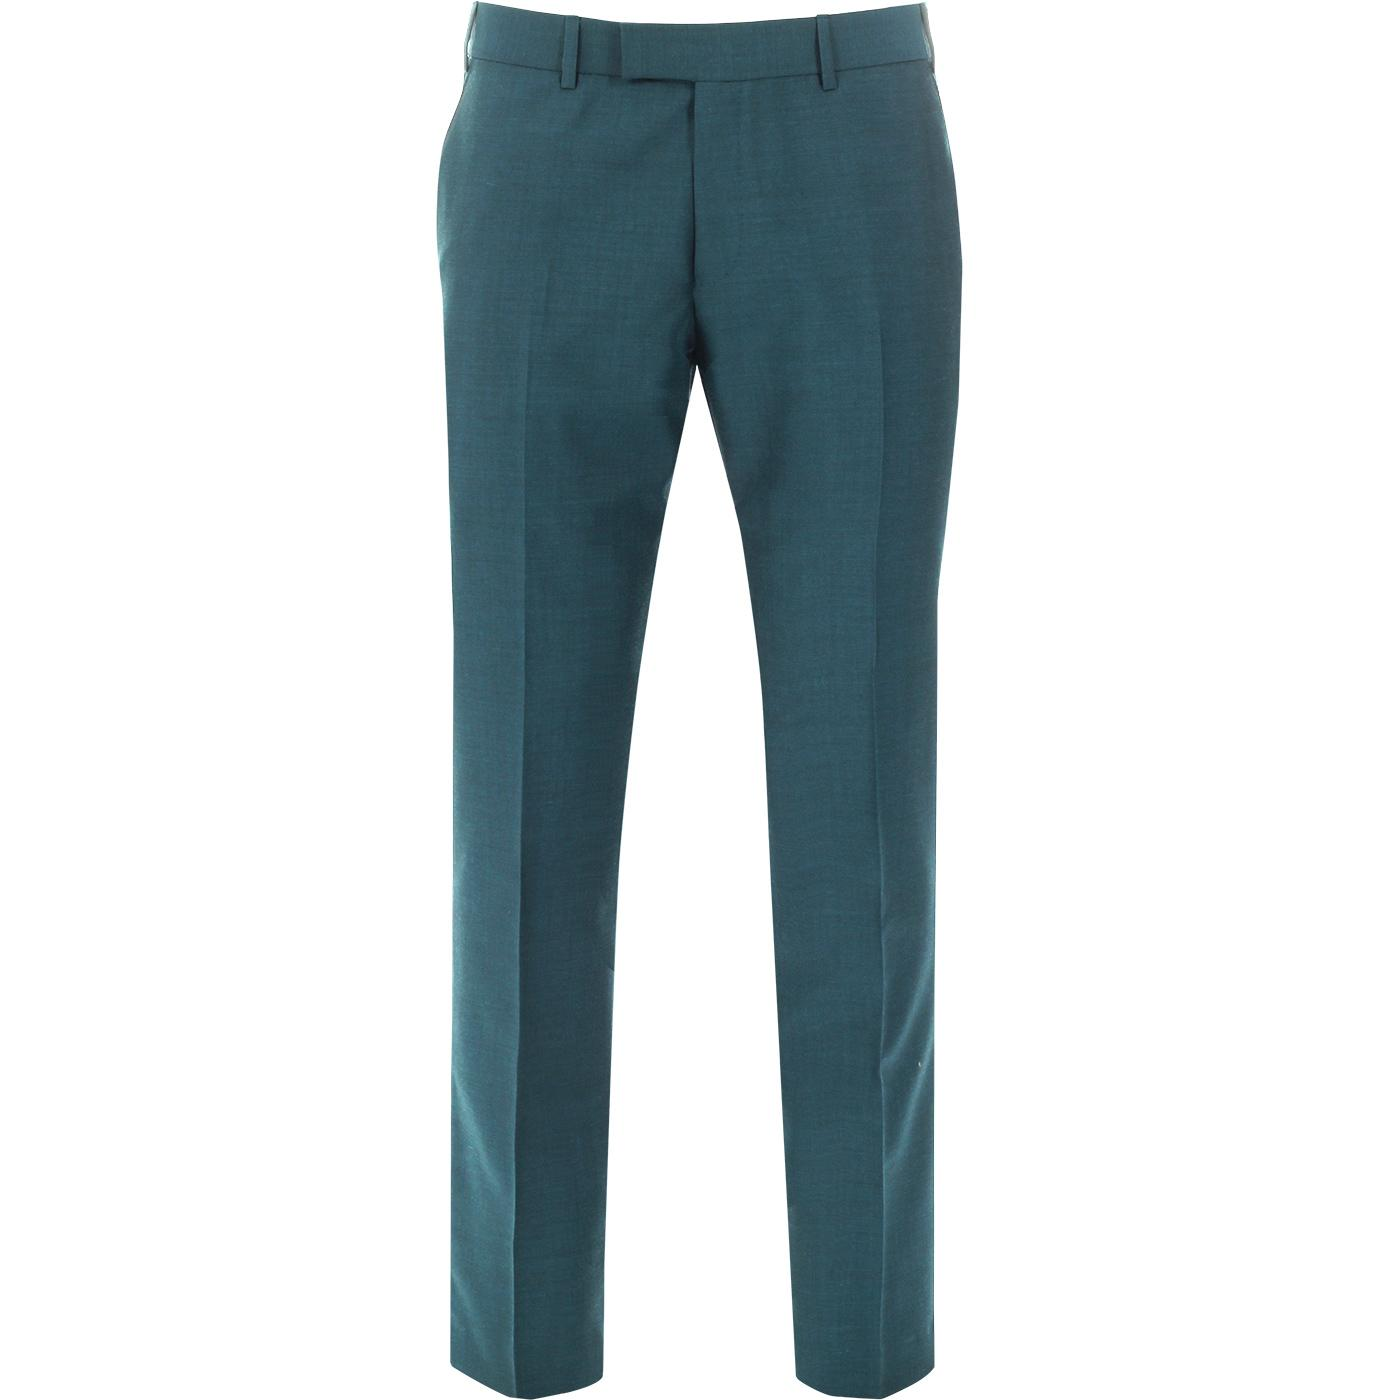 MADCAP ENGLAND Mod Mohair Tonic Trousers (Teal)